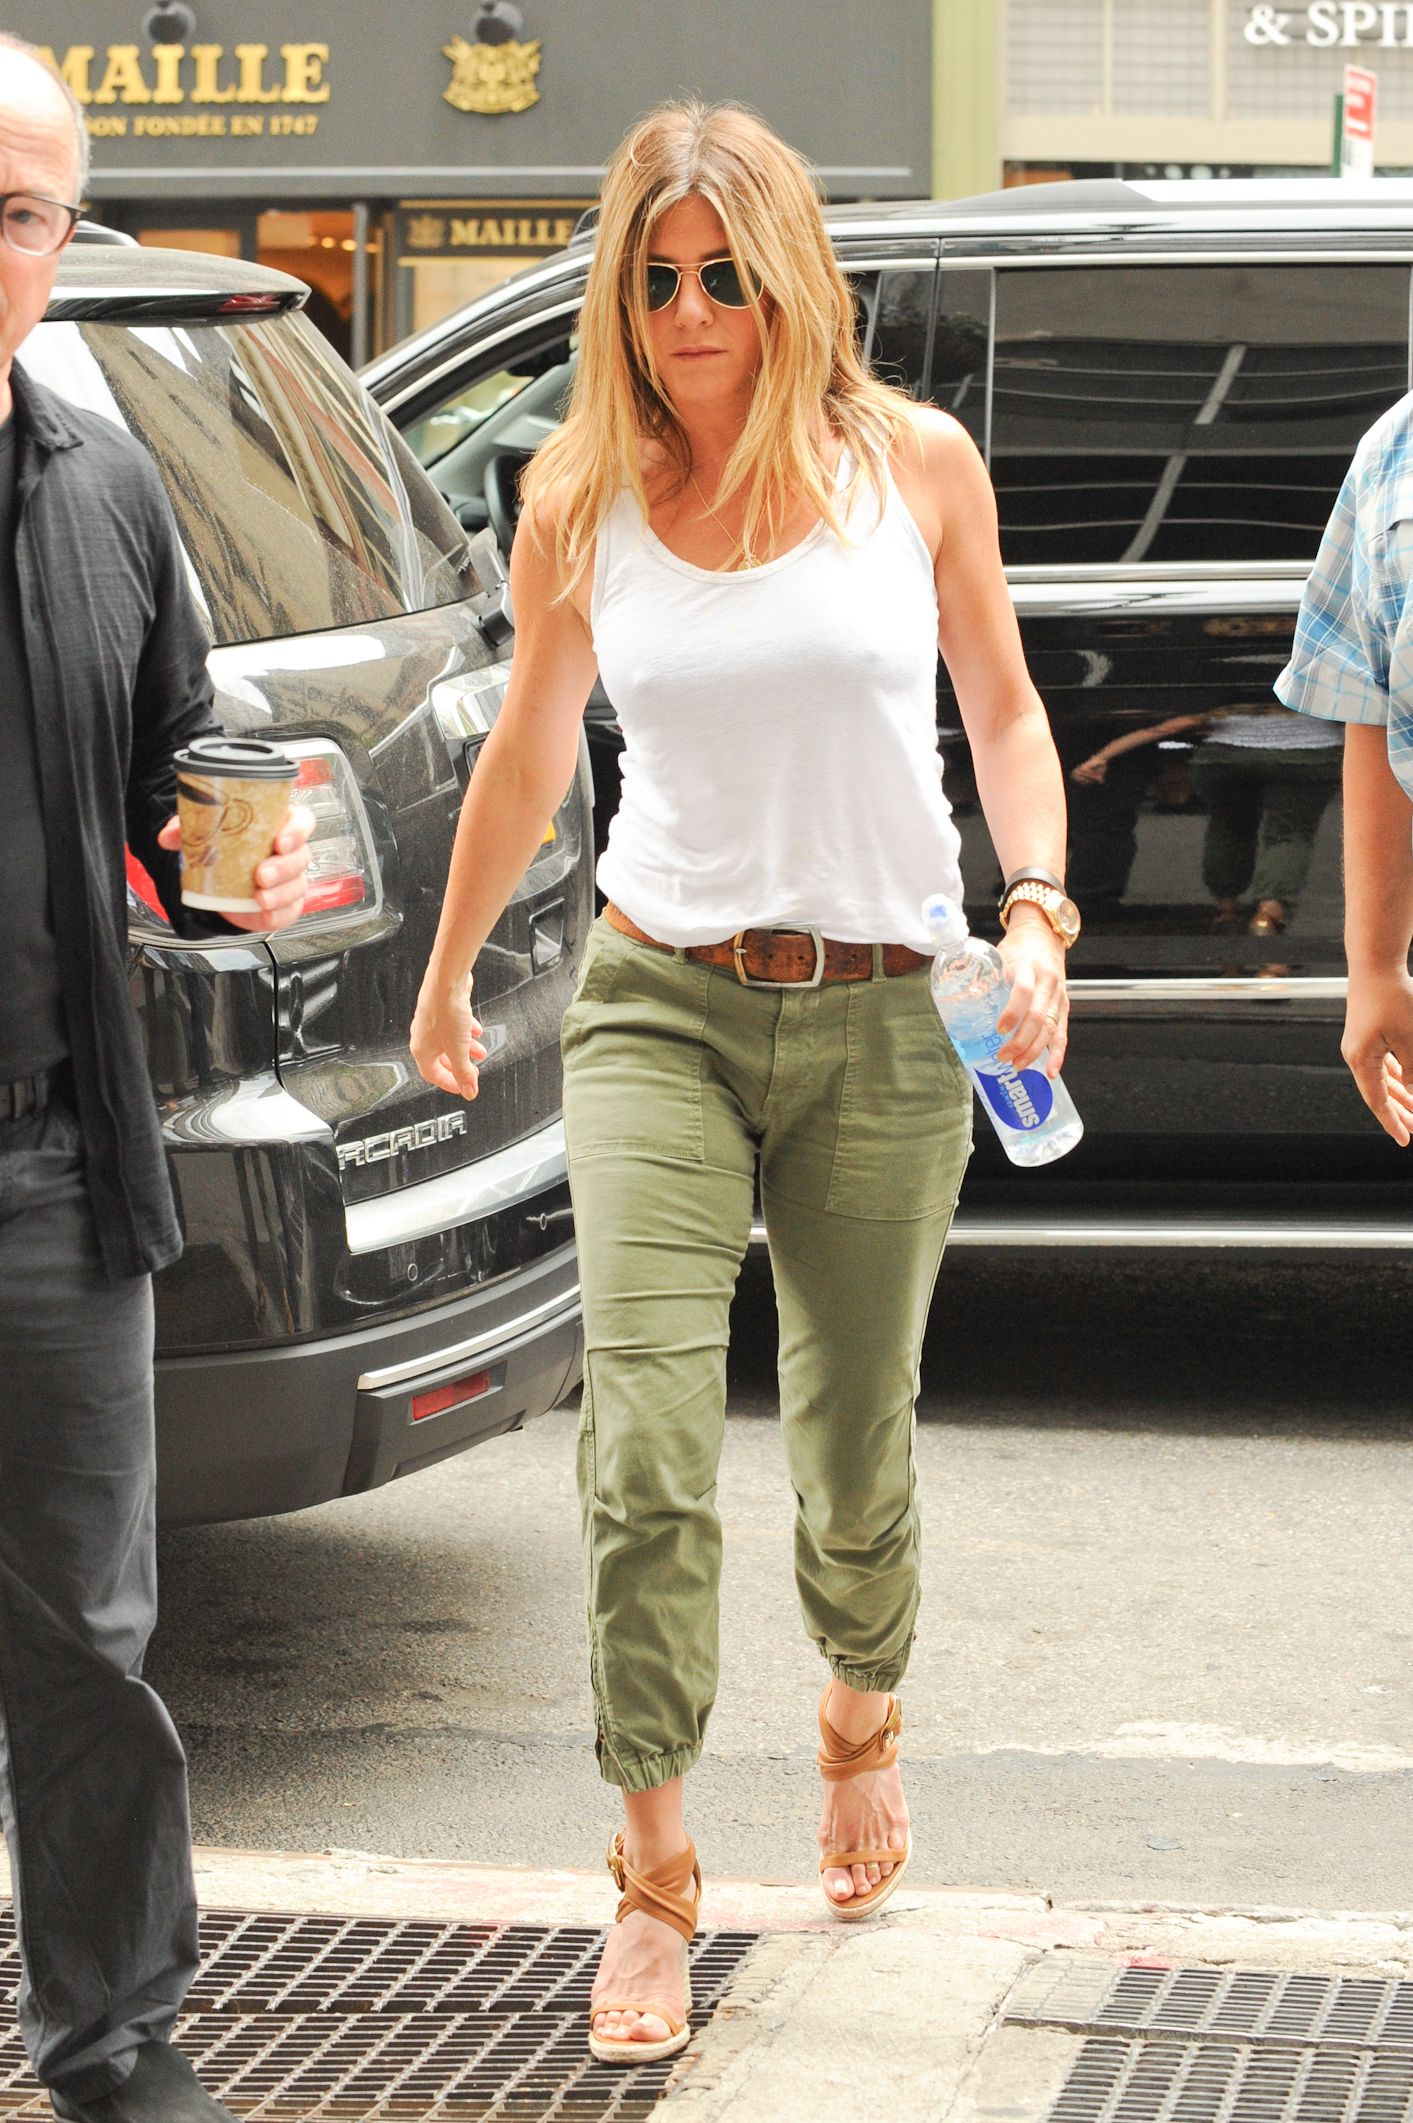 Slap Tv Actress Jennifer Aniston Nude Leaked Pics - Fappening Sauce-5434